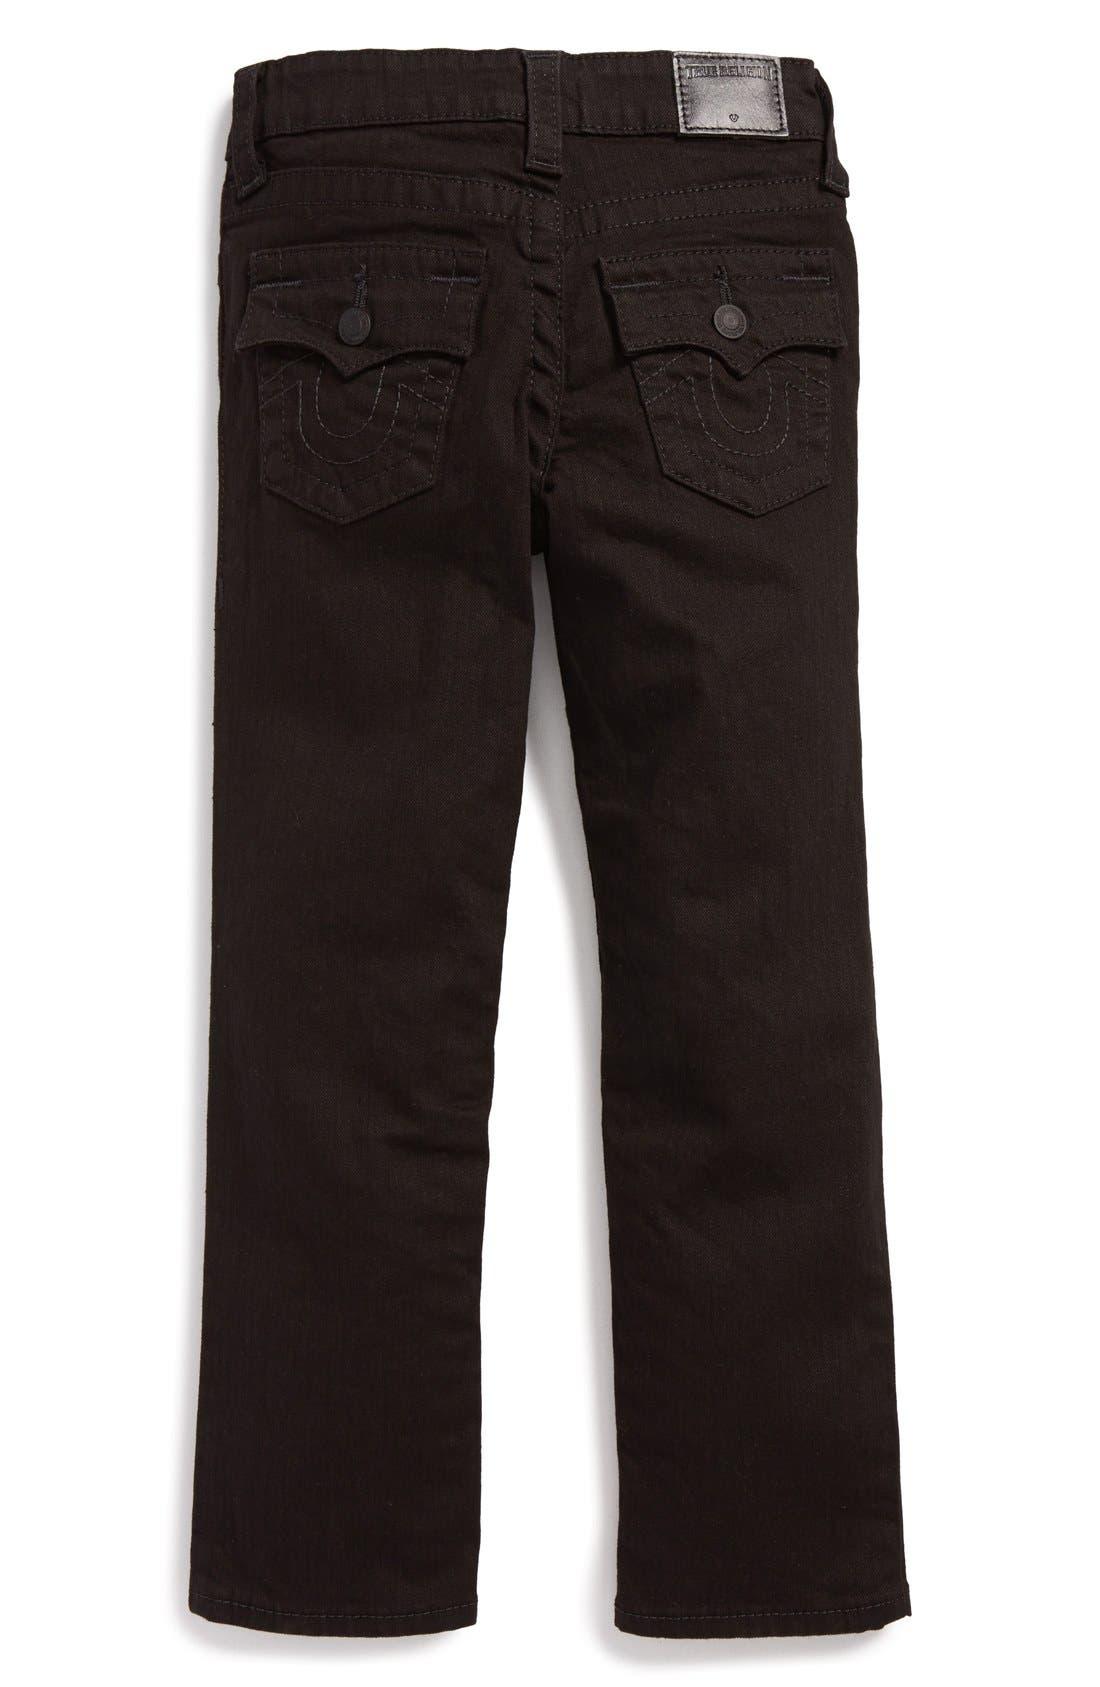 Alternate Image 2  - True Religion Brand Jeans 'Geno' Relaxed Slim Fit Jeans (Toddler Boys & Little Boys)